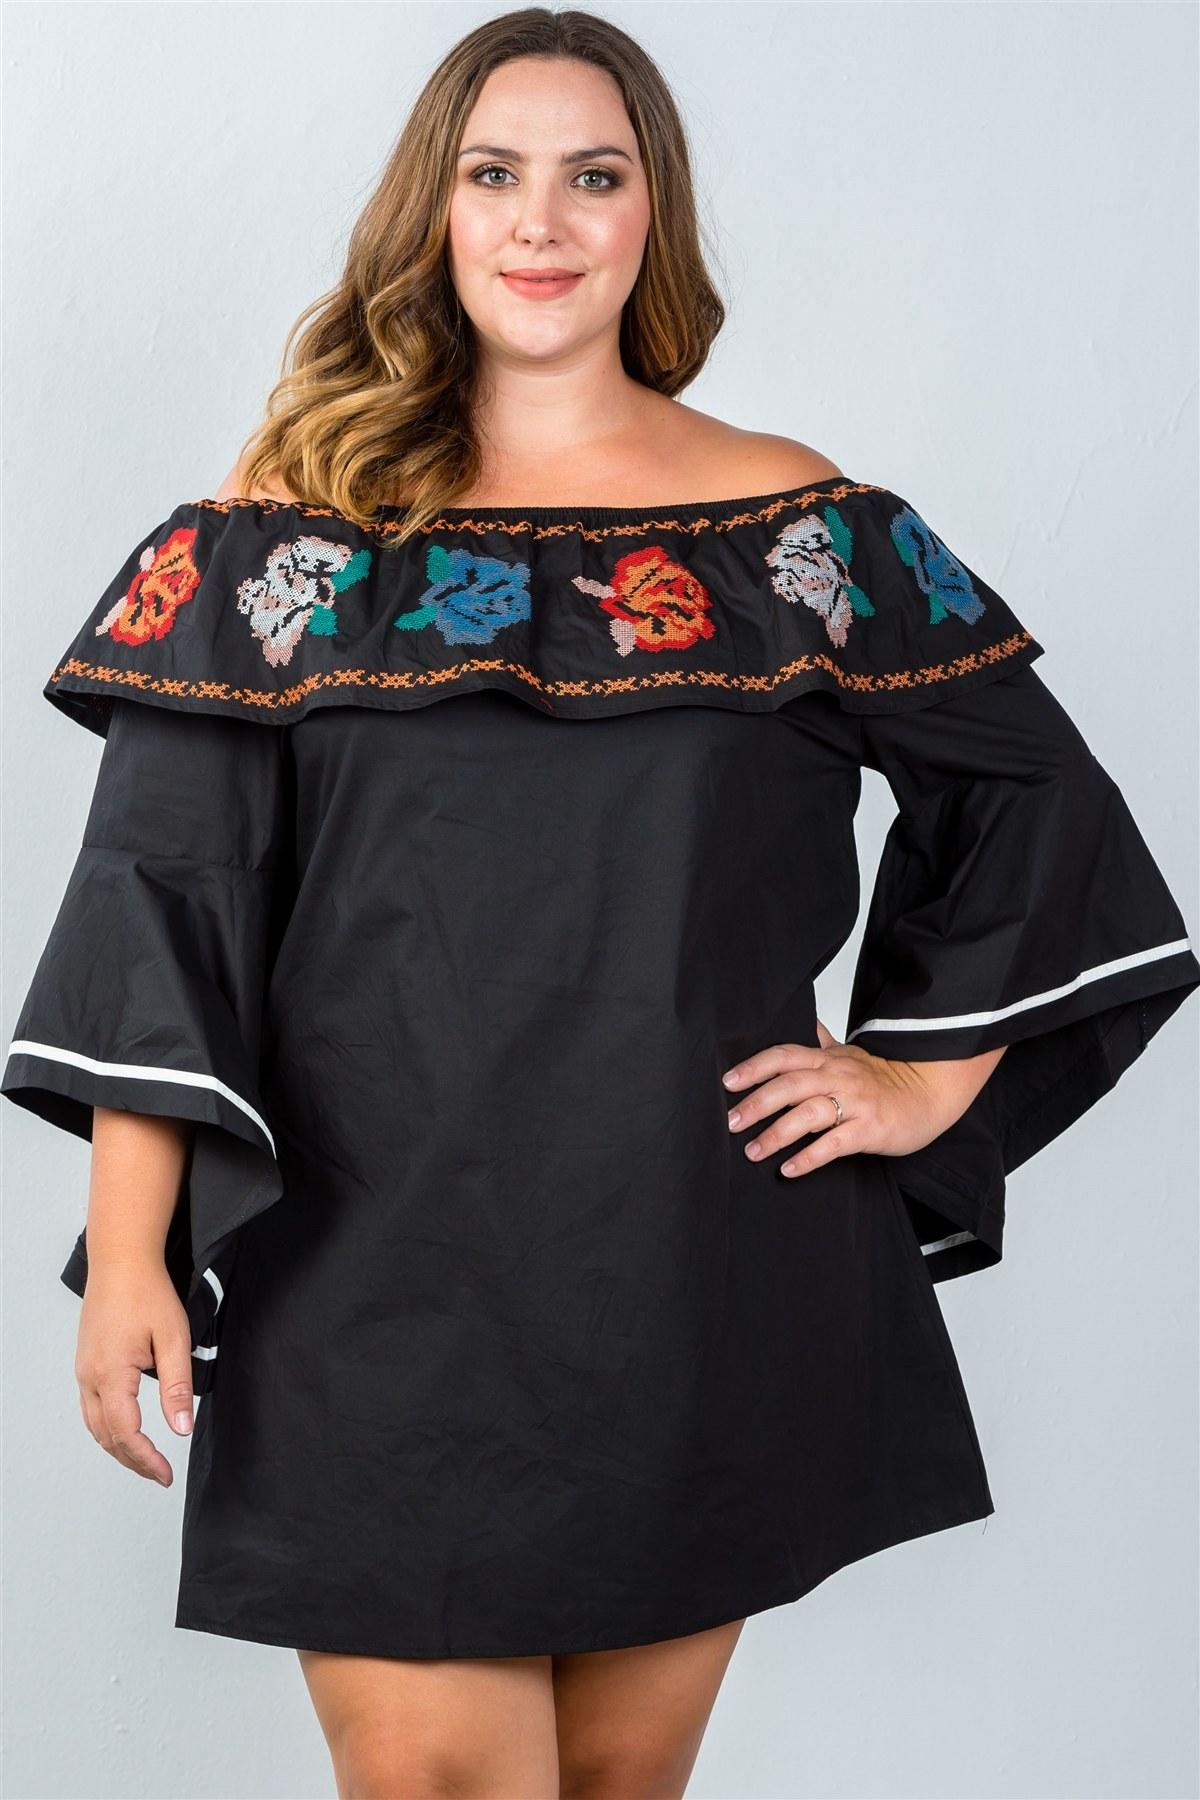 4cee2087c336b Ladies fashion plus size flounce off the shoulder dress-id.CC36271. Black